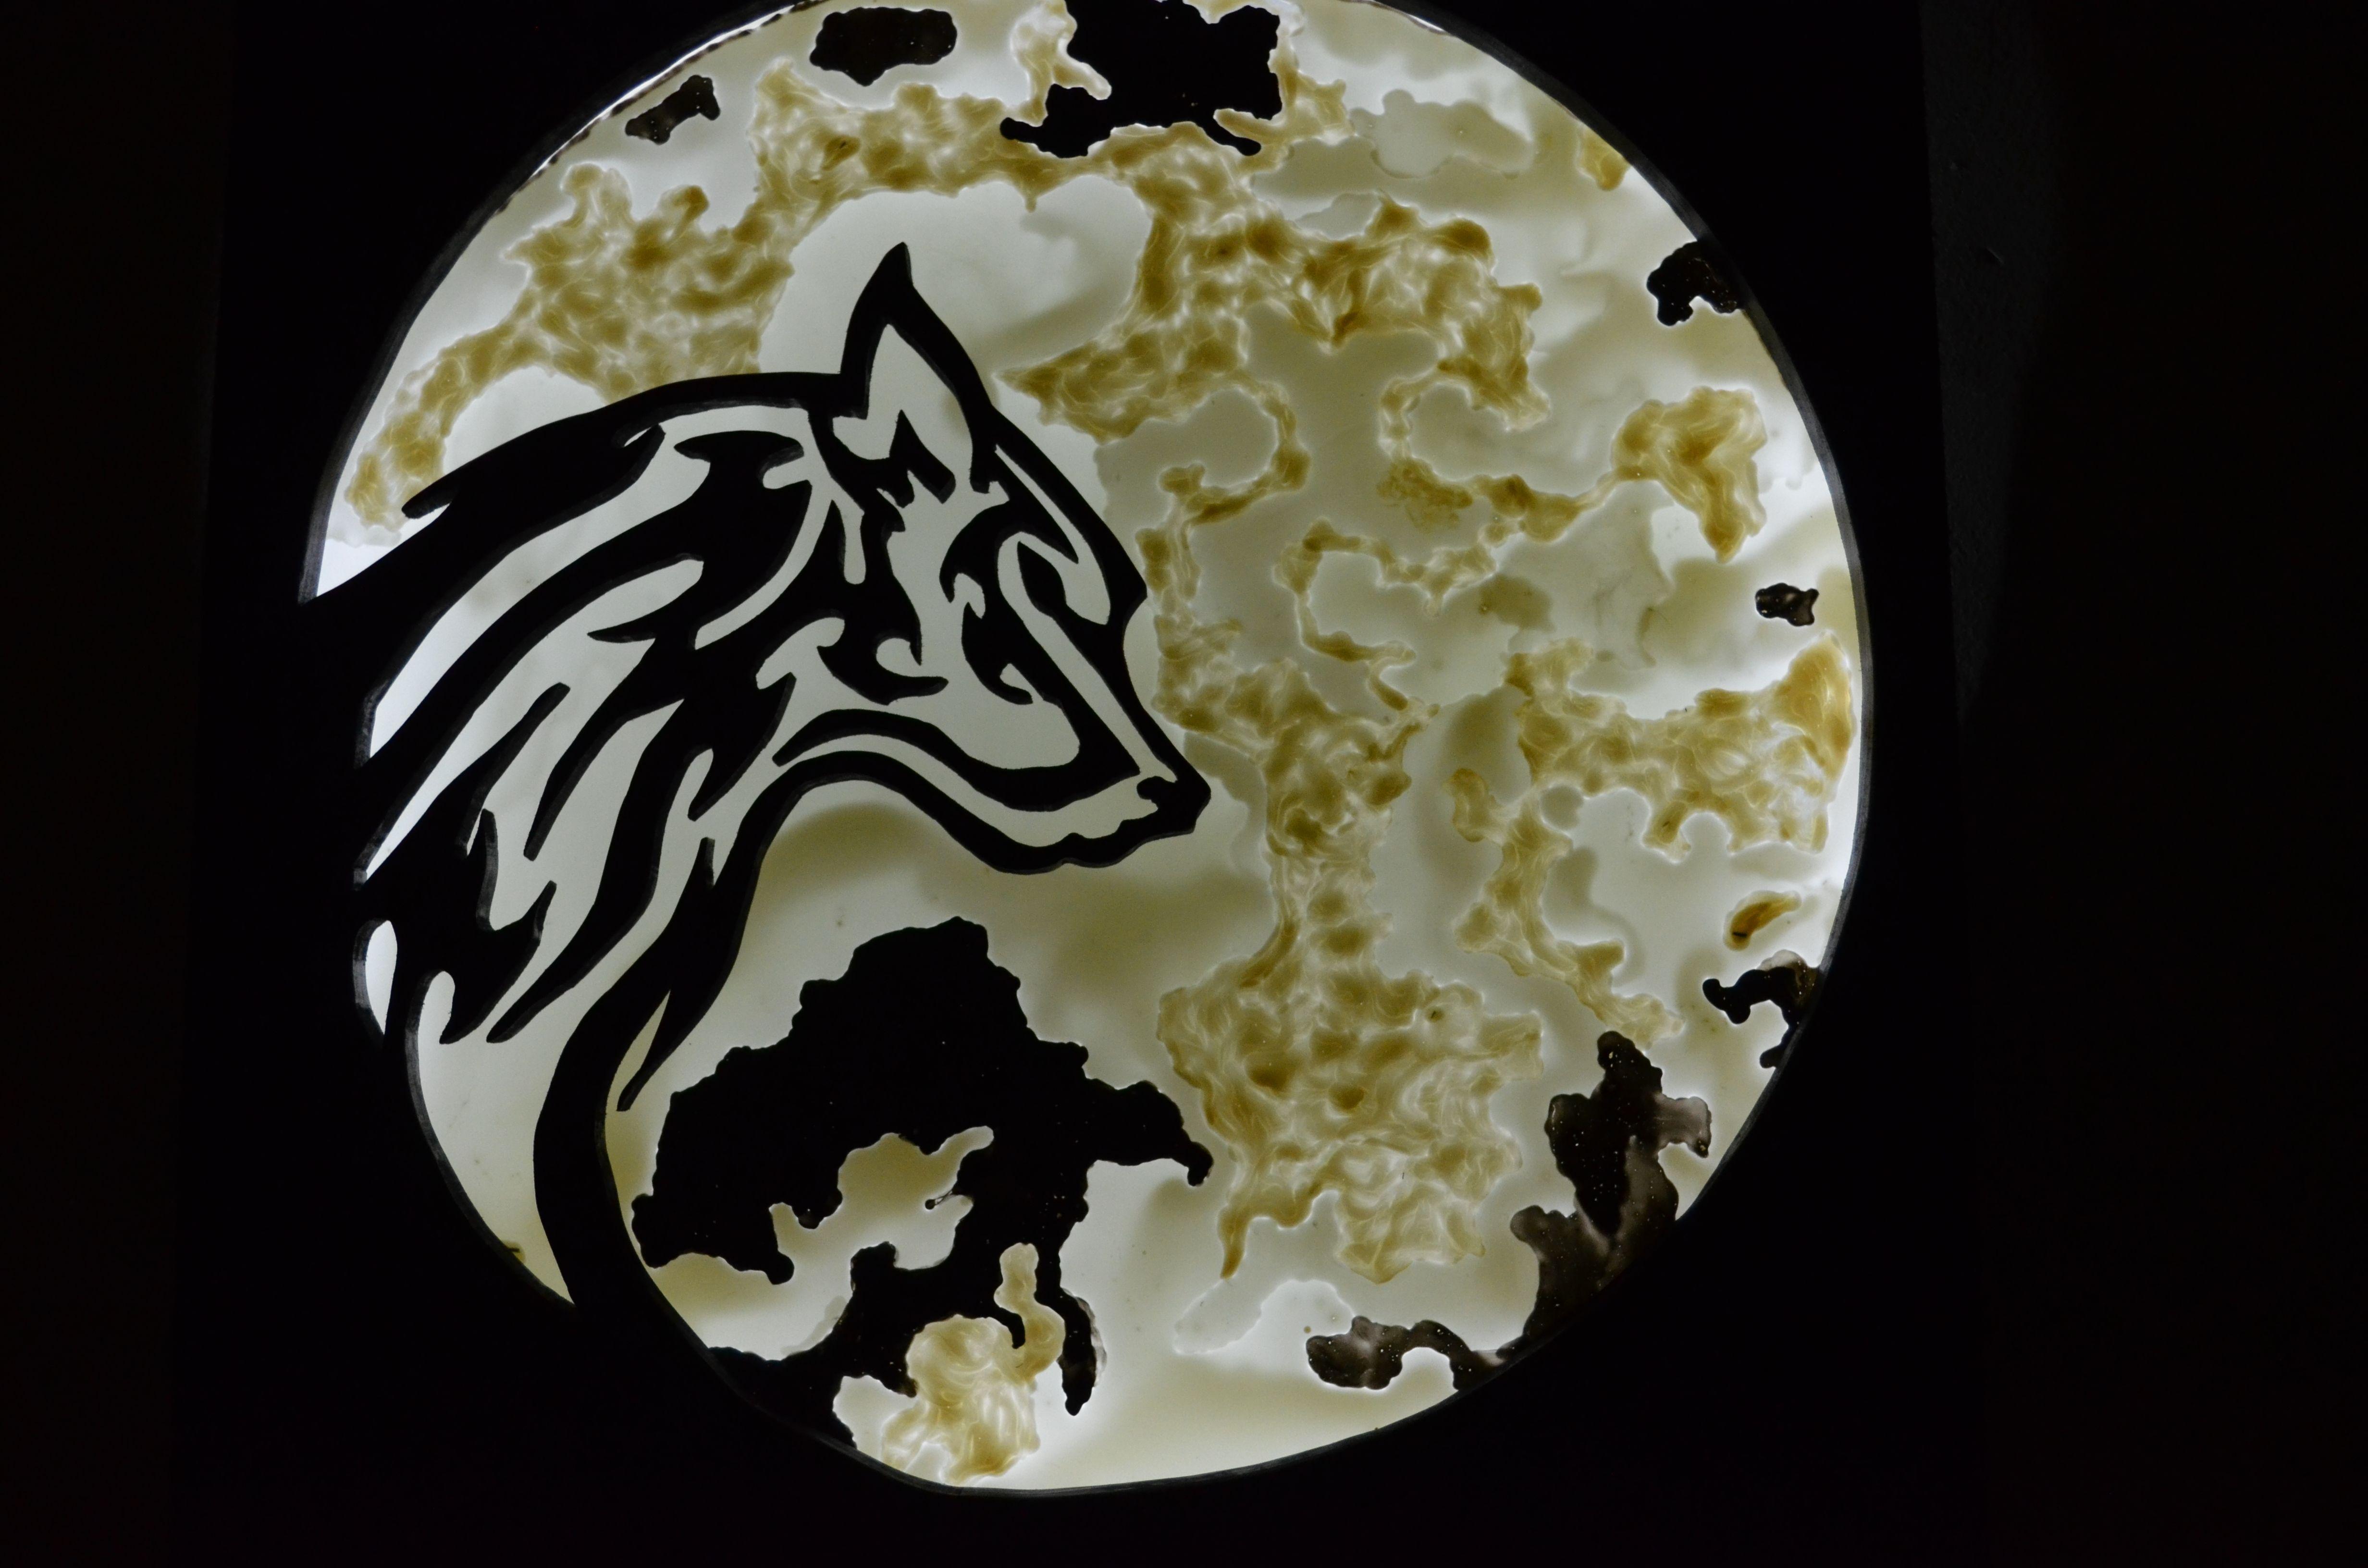 b9073f129430 Ξύλινο φωτιστικό τοίχου (λύκος   πλαίσιο) Ζωγραφική σε τζάμι (φωτιζόμενο  φεγγάρι). Wall light fixture made of wood(wolf)  painted glass(moon)